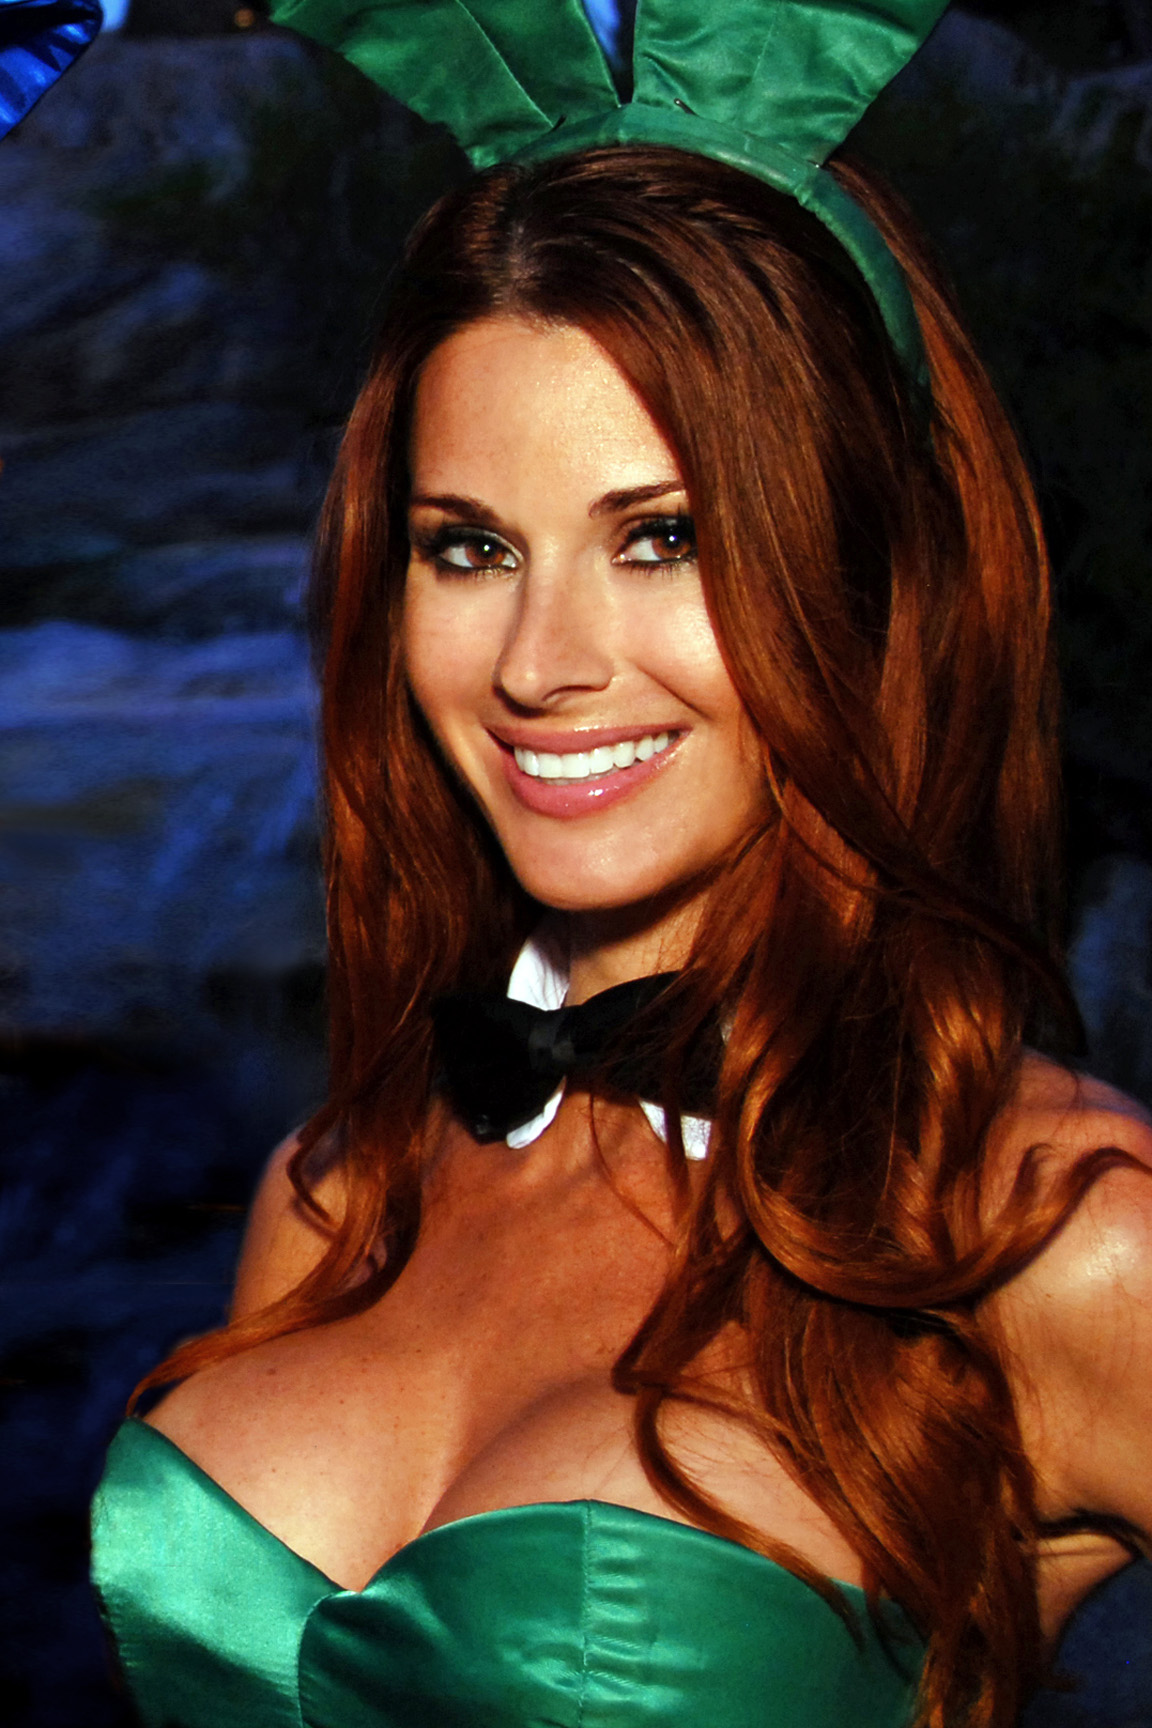 List of Playboy Playmates of 2010 - Wikipedia